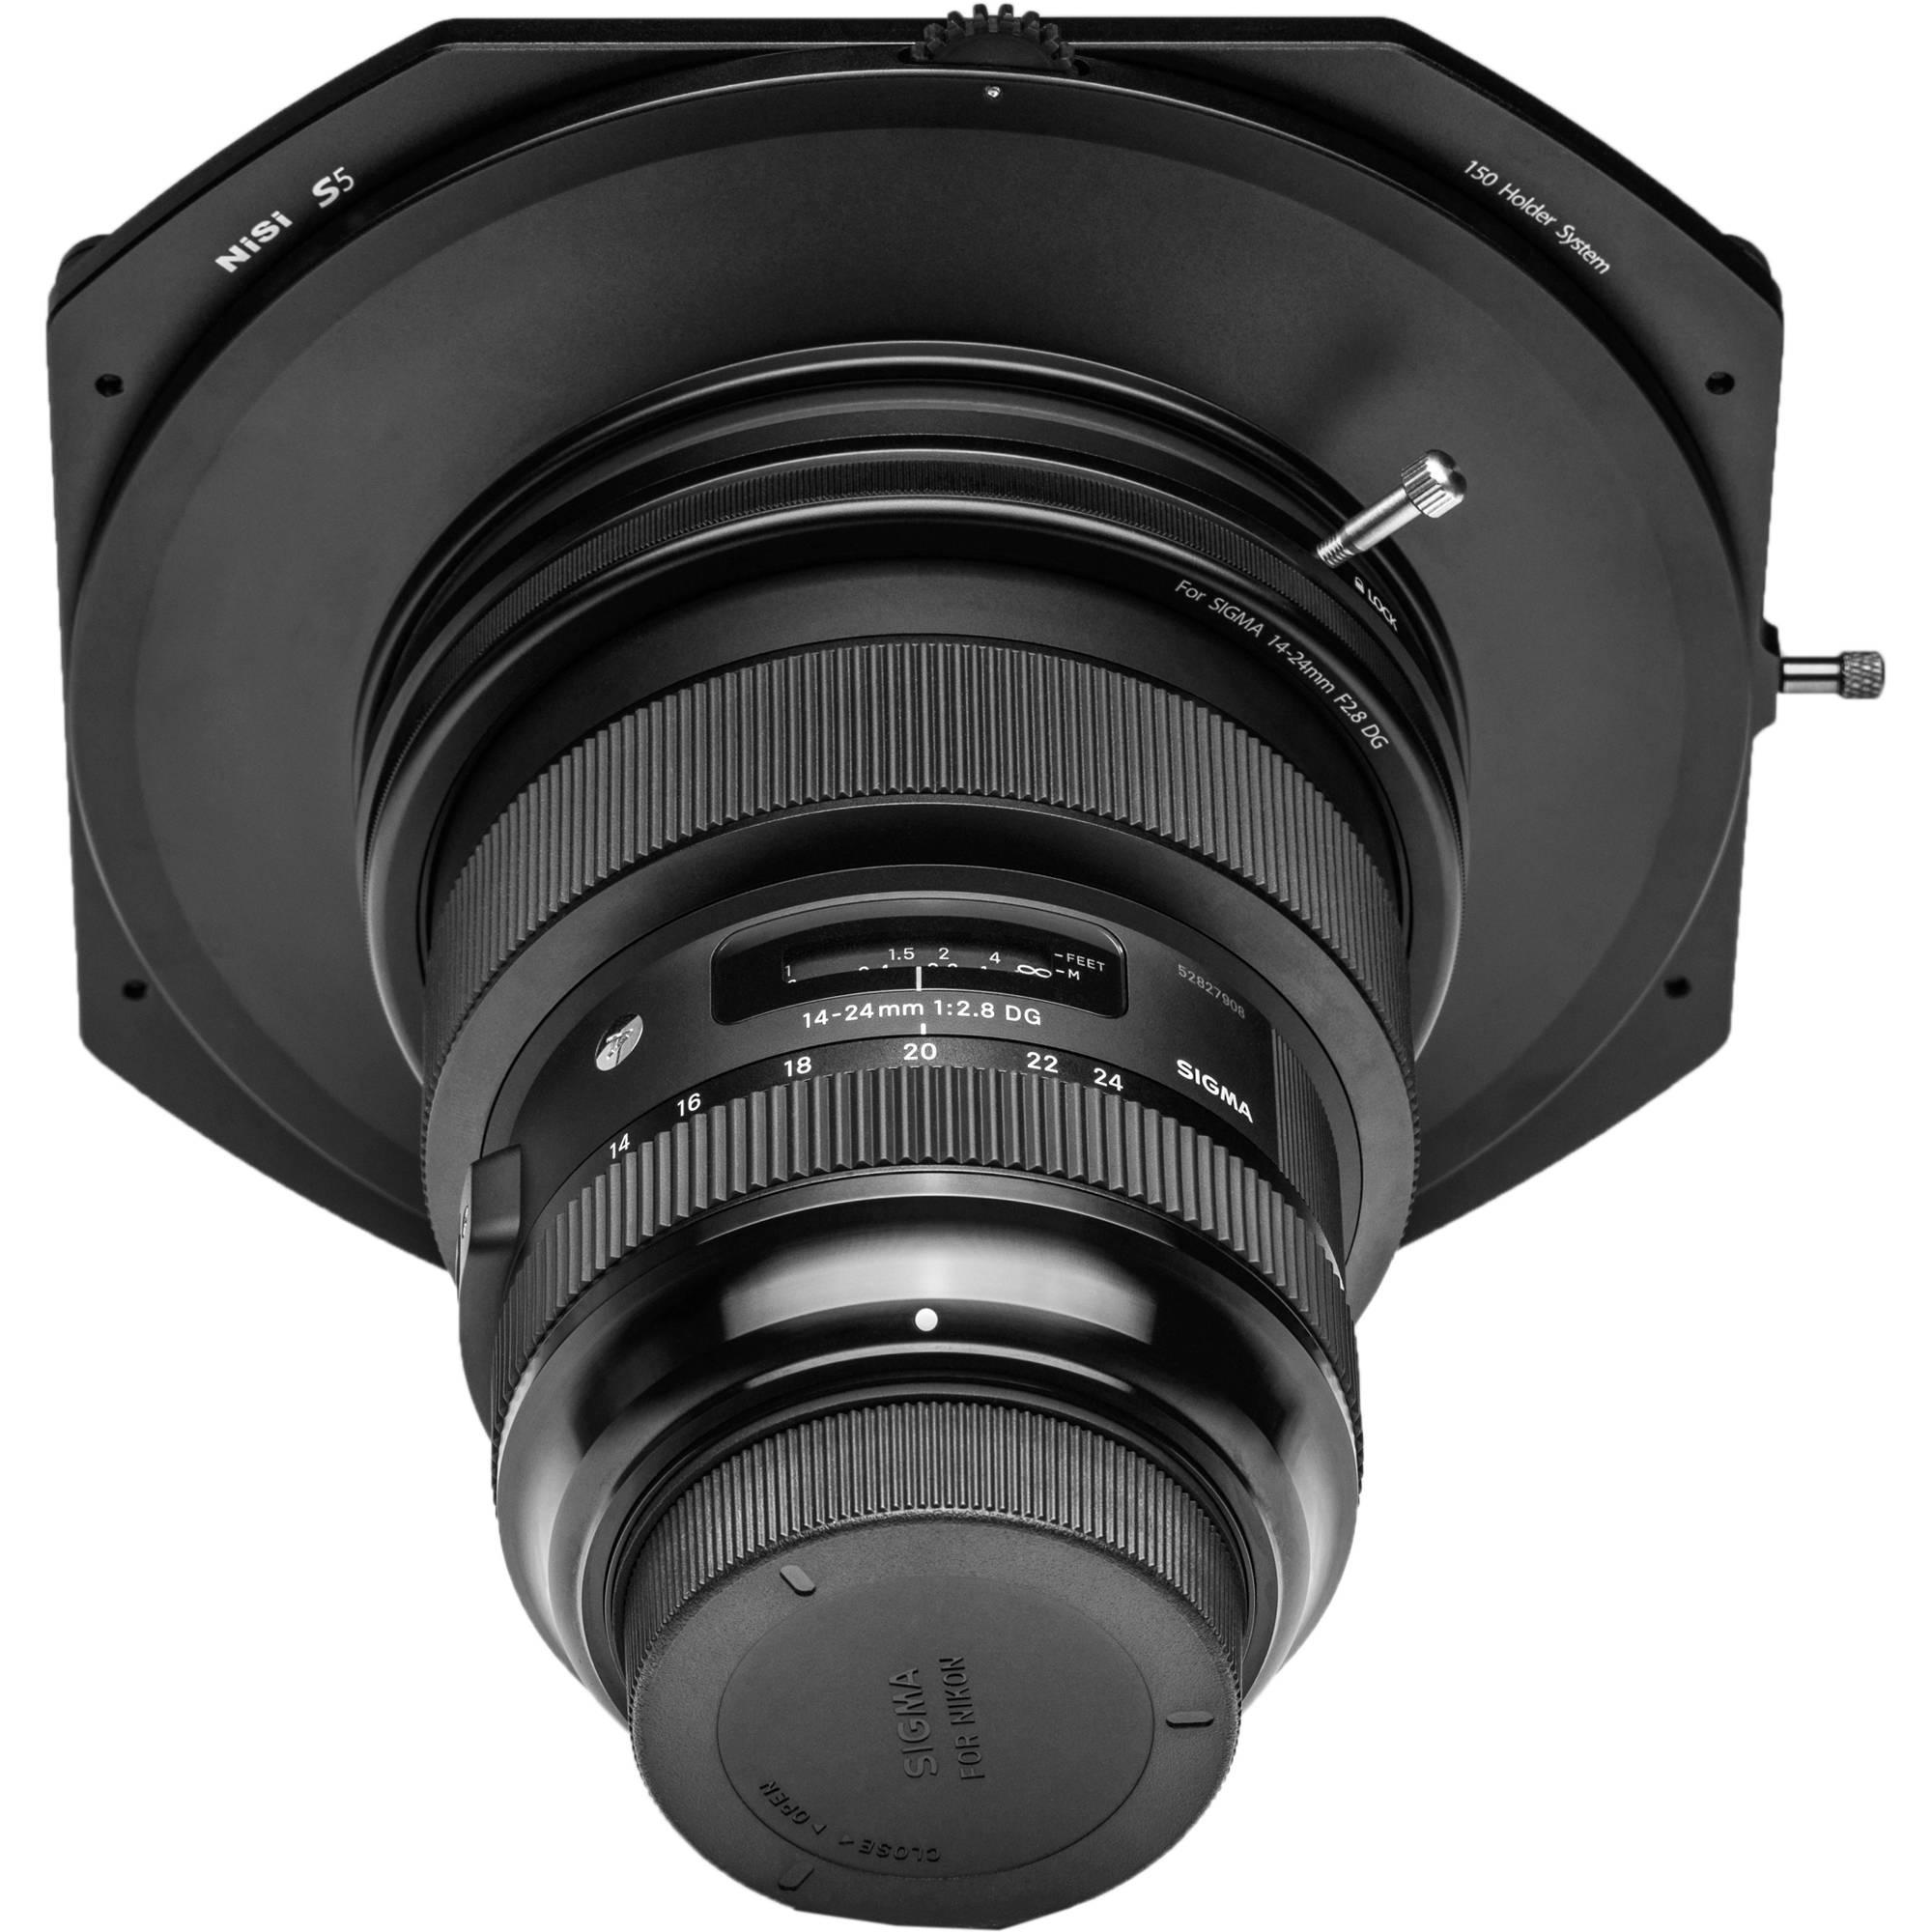 Nisi S5 150mm Filter Holder Kit Nip Fh150 Si1424 Bh Photo For Phantom 4 Pro With Circular Polarizer Sigma 14 24mm Art Lens